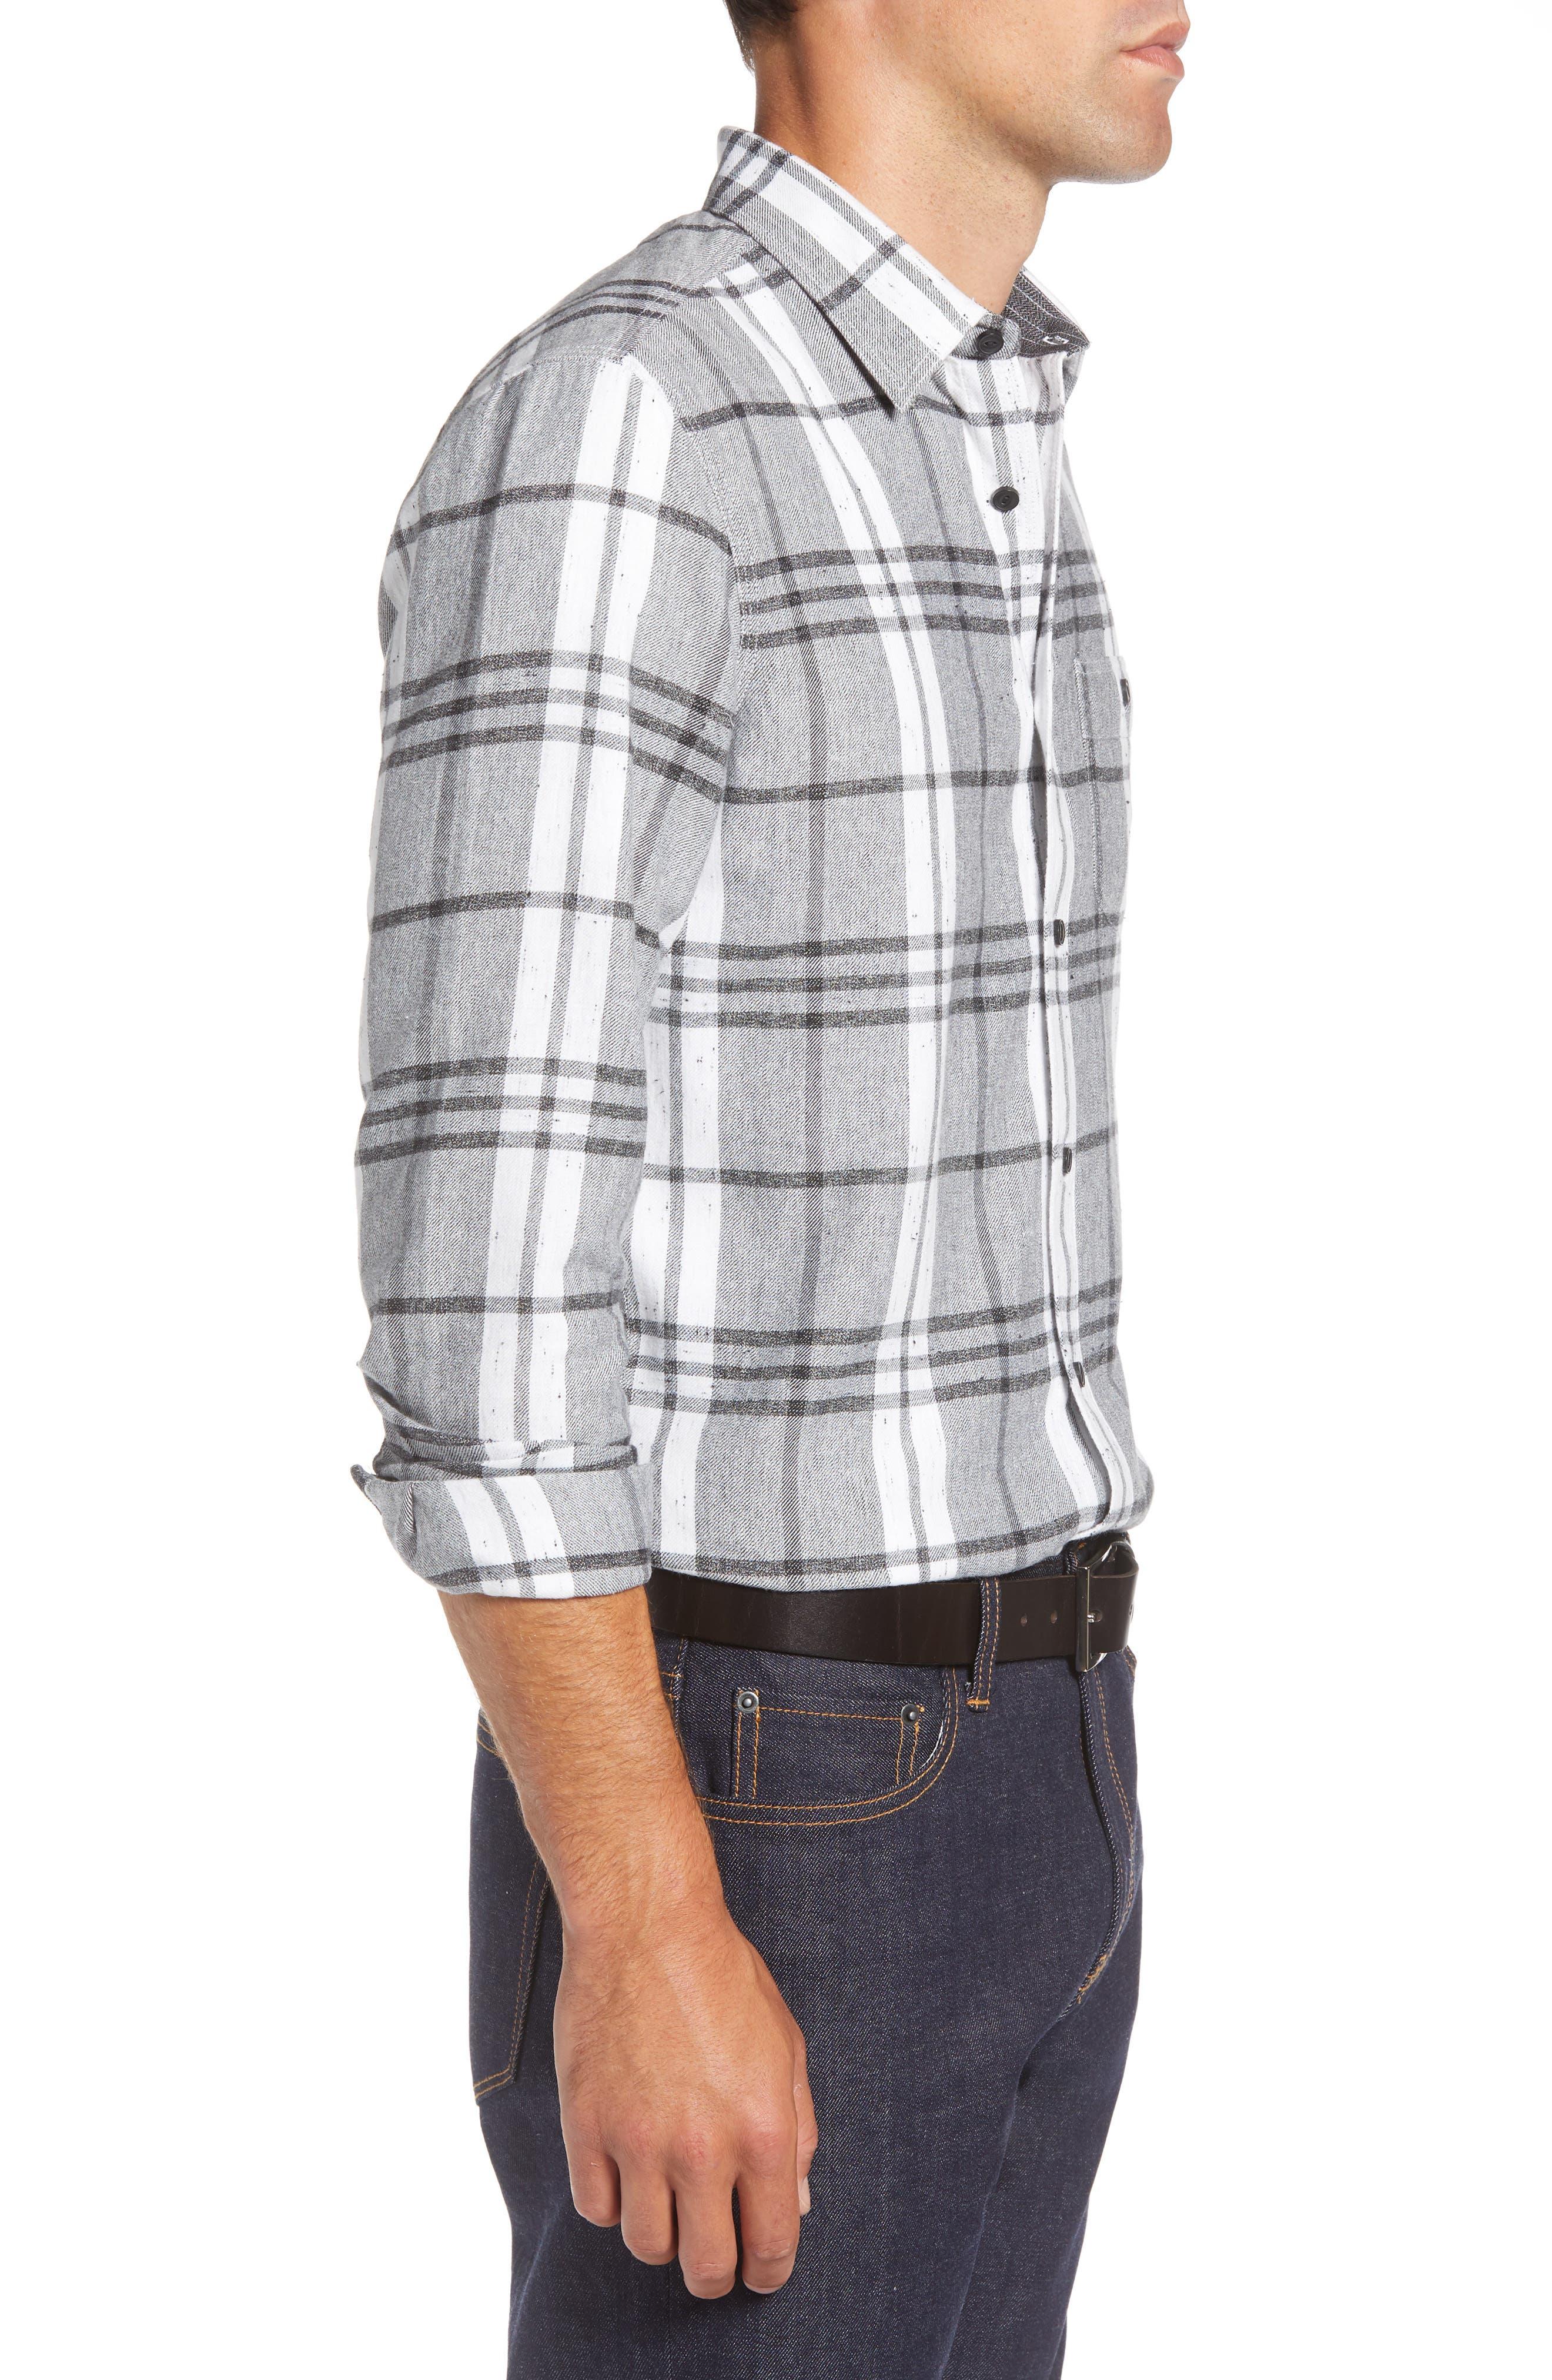 Trim Fit Brushed Plaid Utility Shirt,                             Alternate thumbnail 4, color,                             GREY CASTLEROCK NEP PLAID